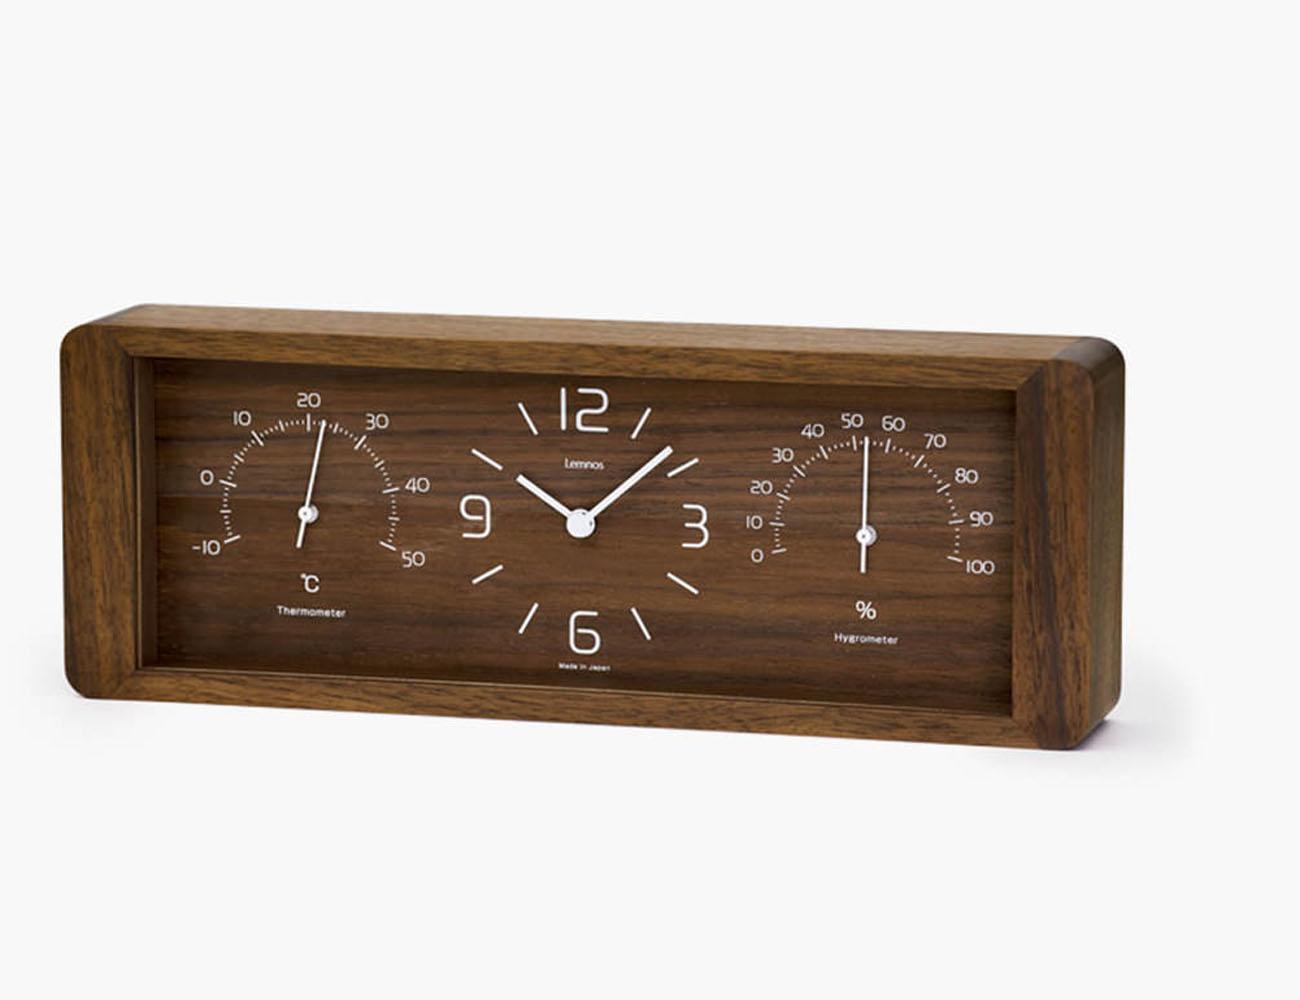 Lemnos Yokan Thermometer & Hygrometer Table Clock